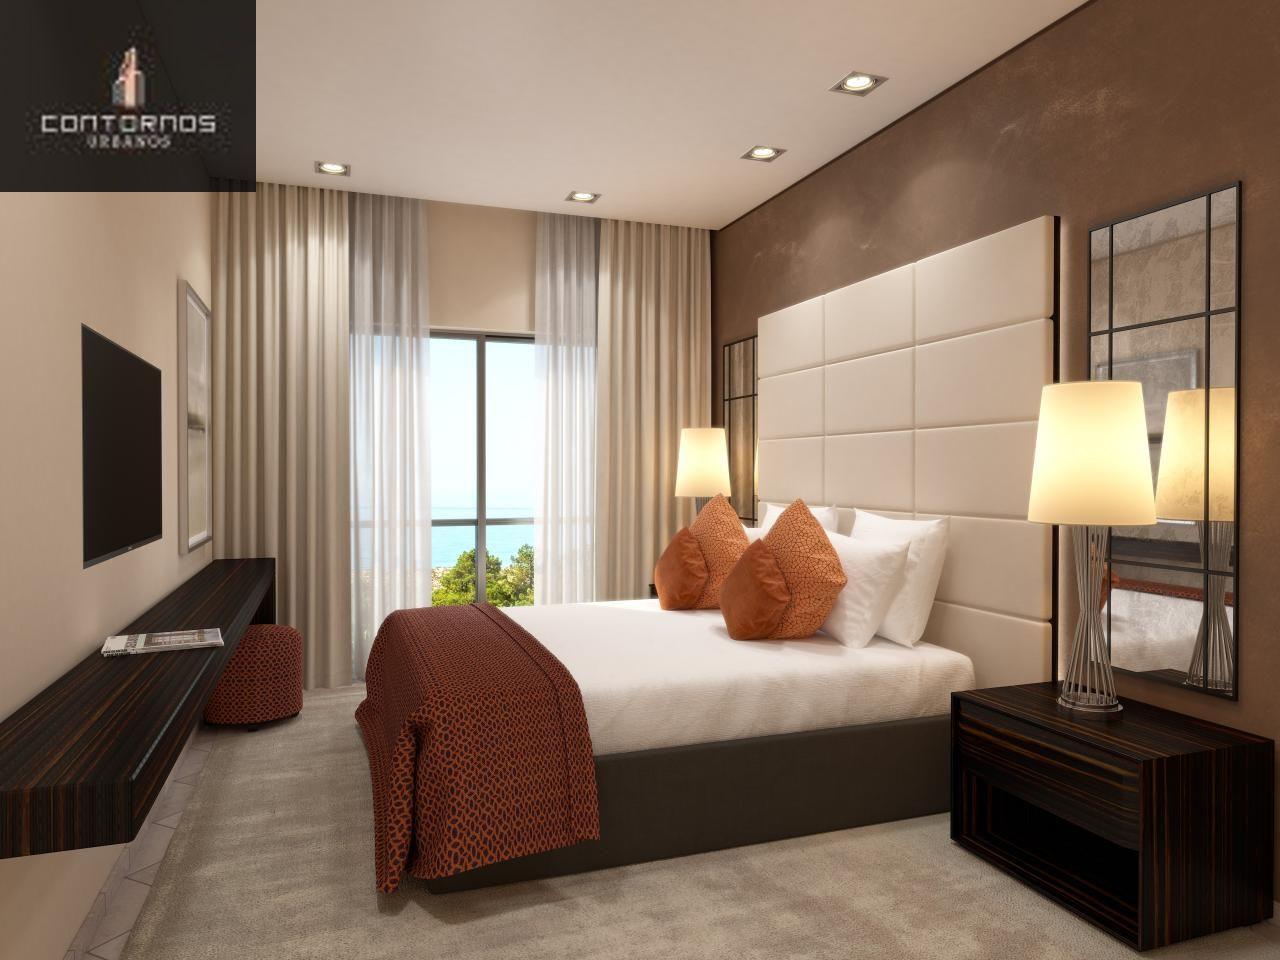 Formosa park hotel apartments Sea View